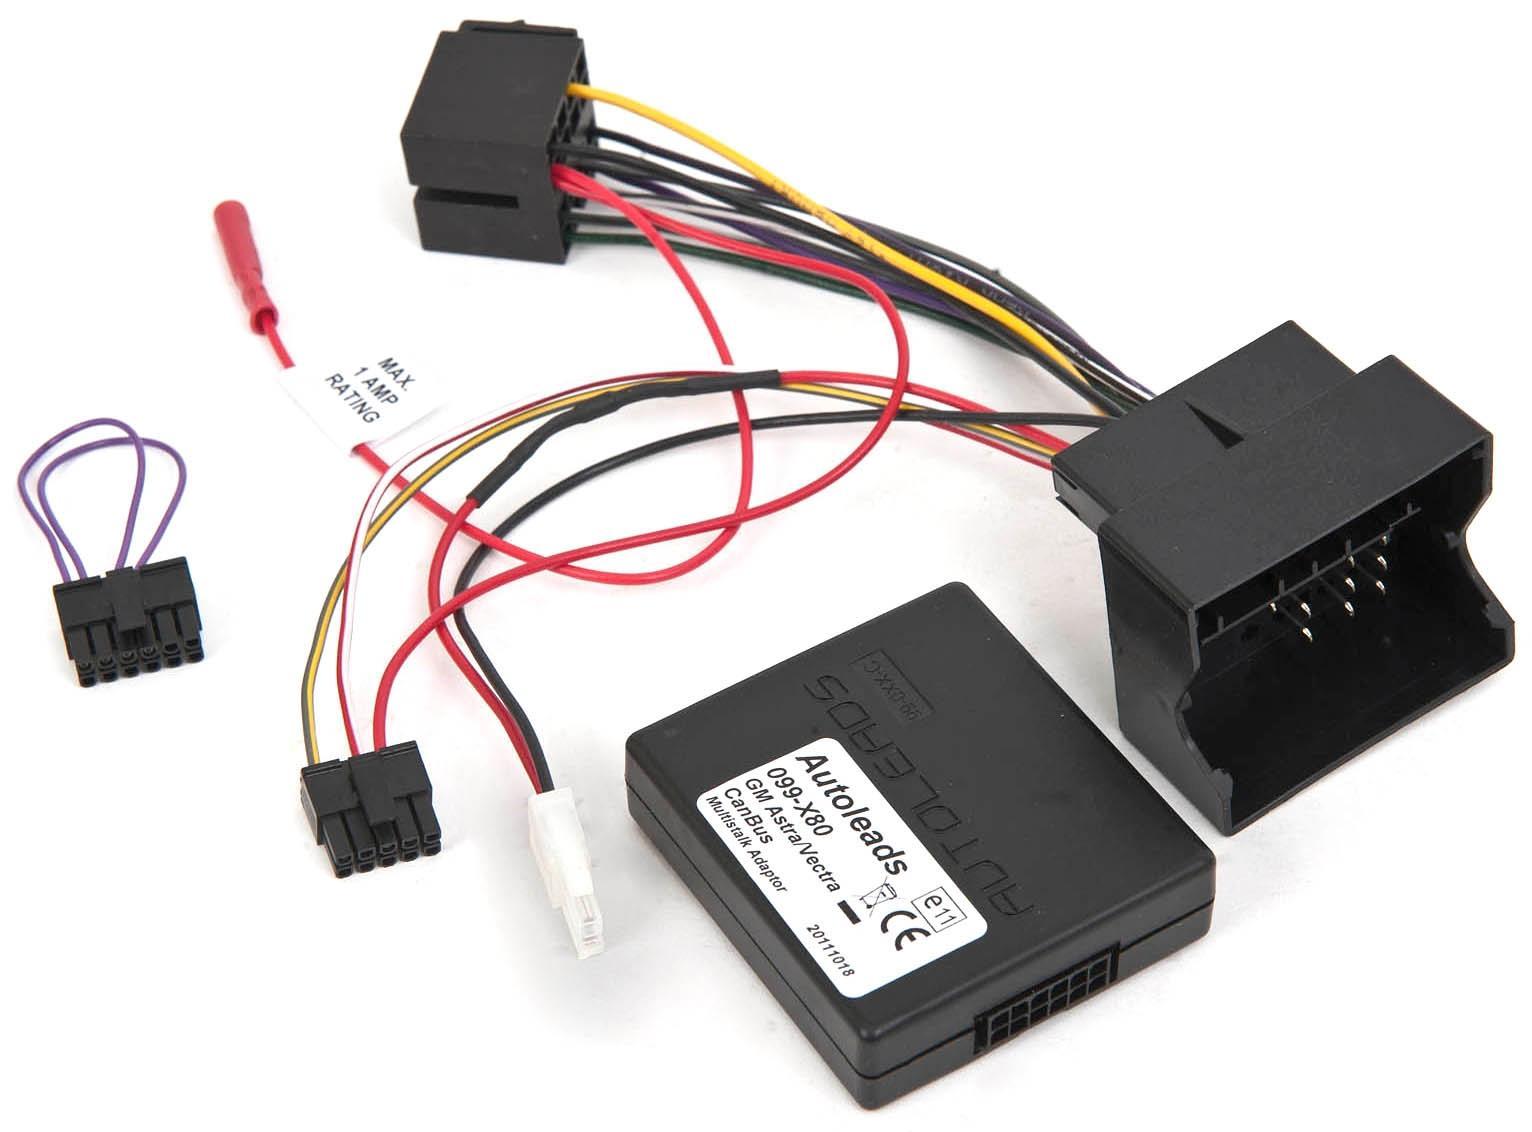 Autoleads PC99-X80 CANbus Car Steering Wheel Stalk Adaptor Vehicle Lead  Vauxhall 5032296000315 | eBay